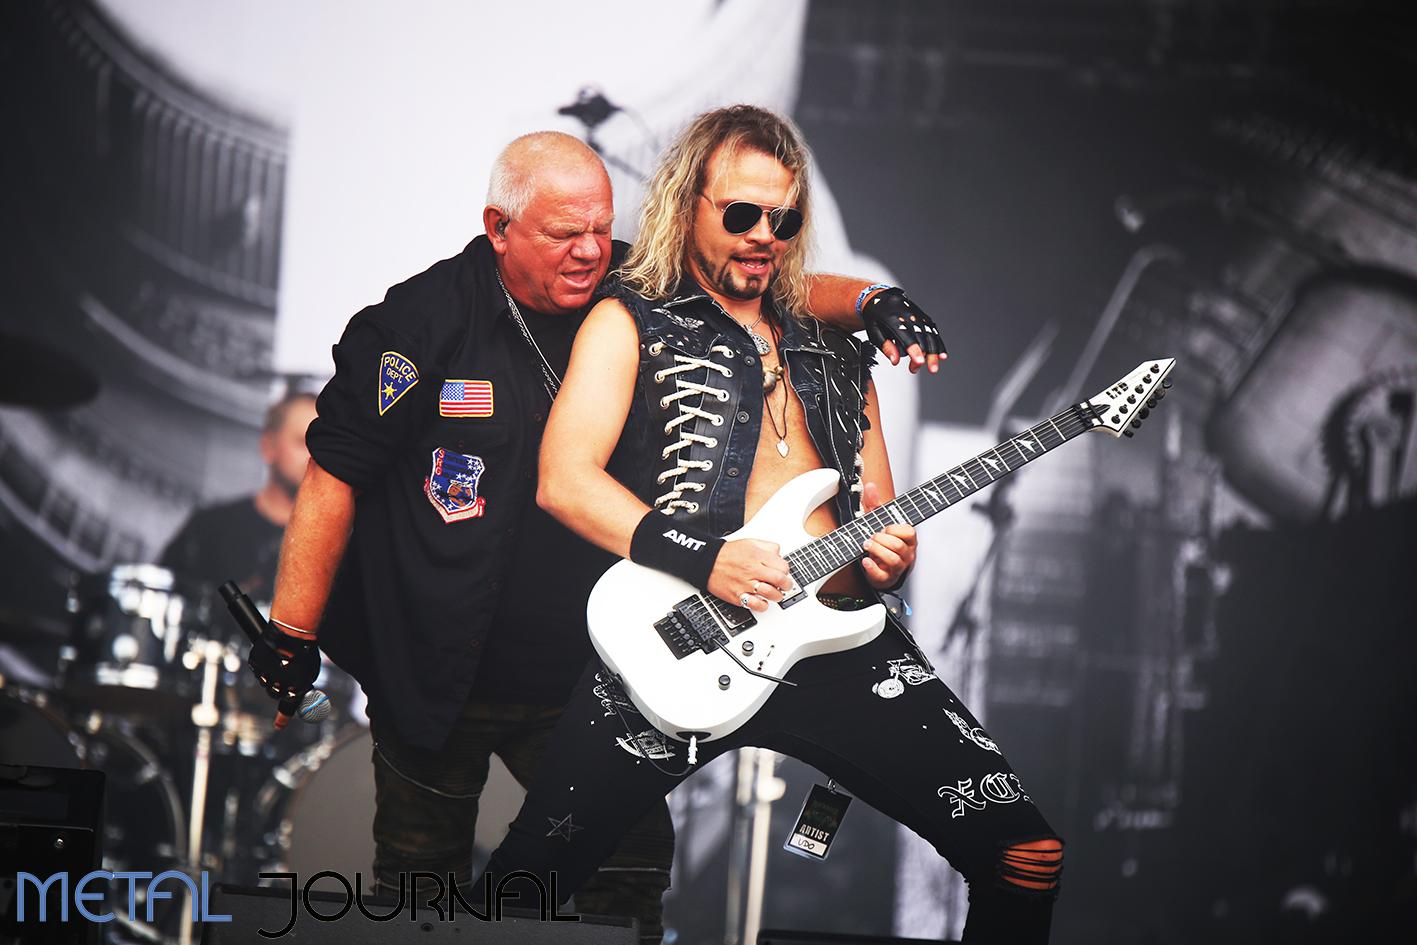 udo - metal journal rock fest barcelona 2019 pic 5